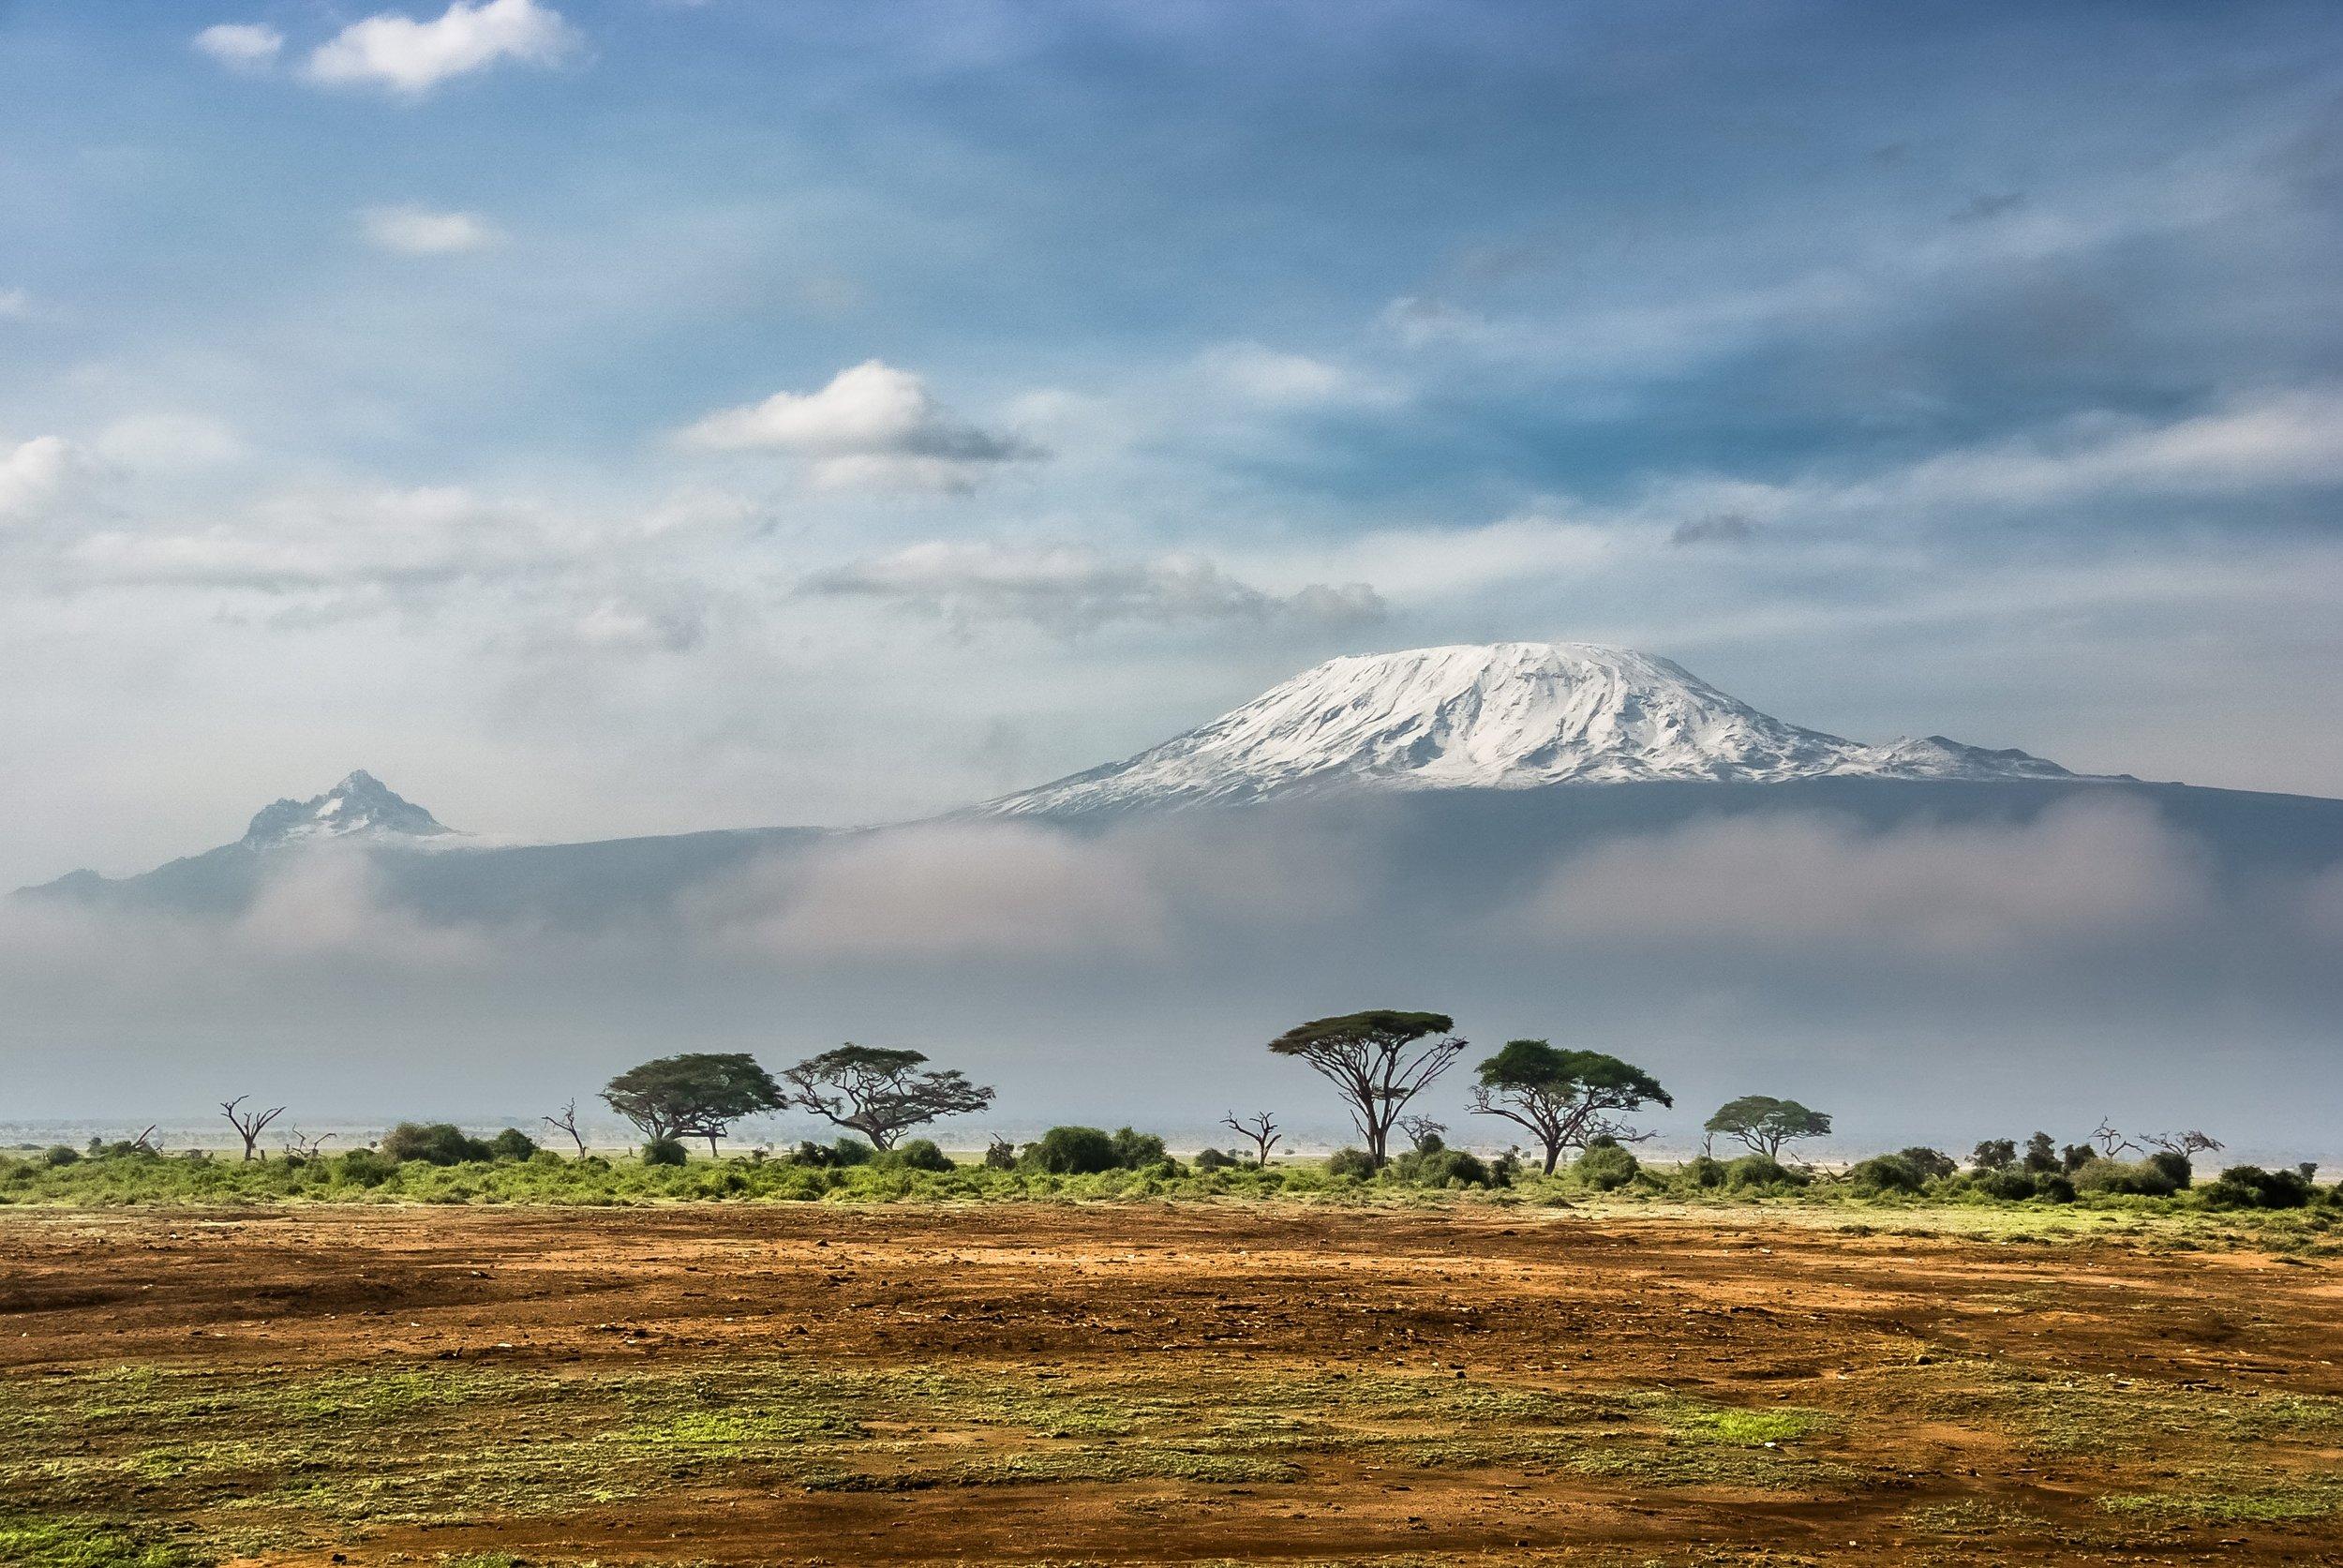 snow topped Mount Kilimanjaro behind the savannah